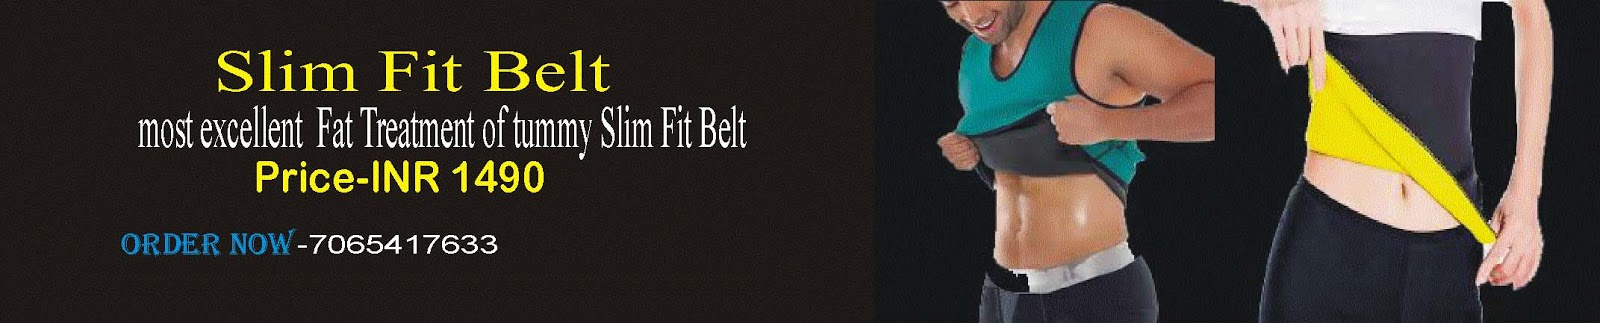 Slim Fit Belt-7065417633